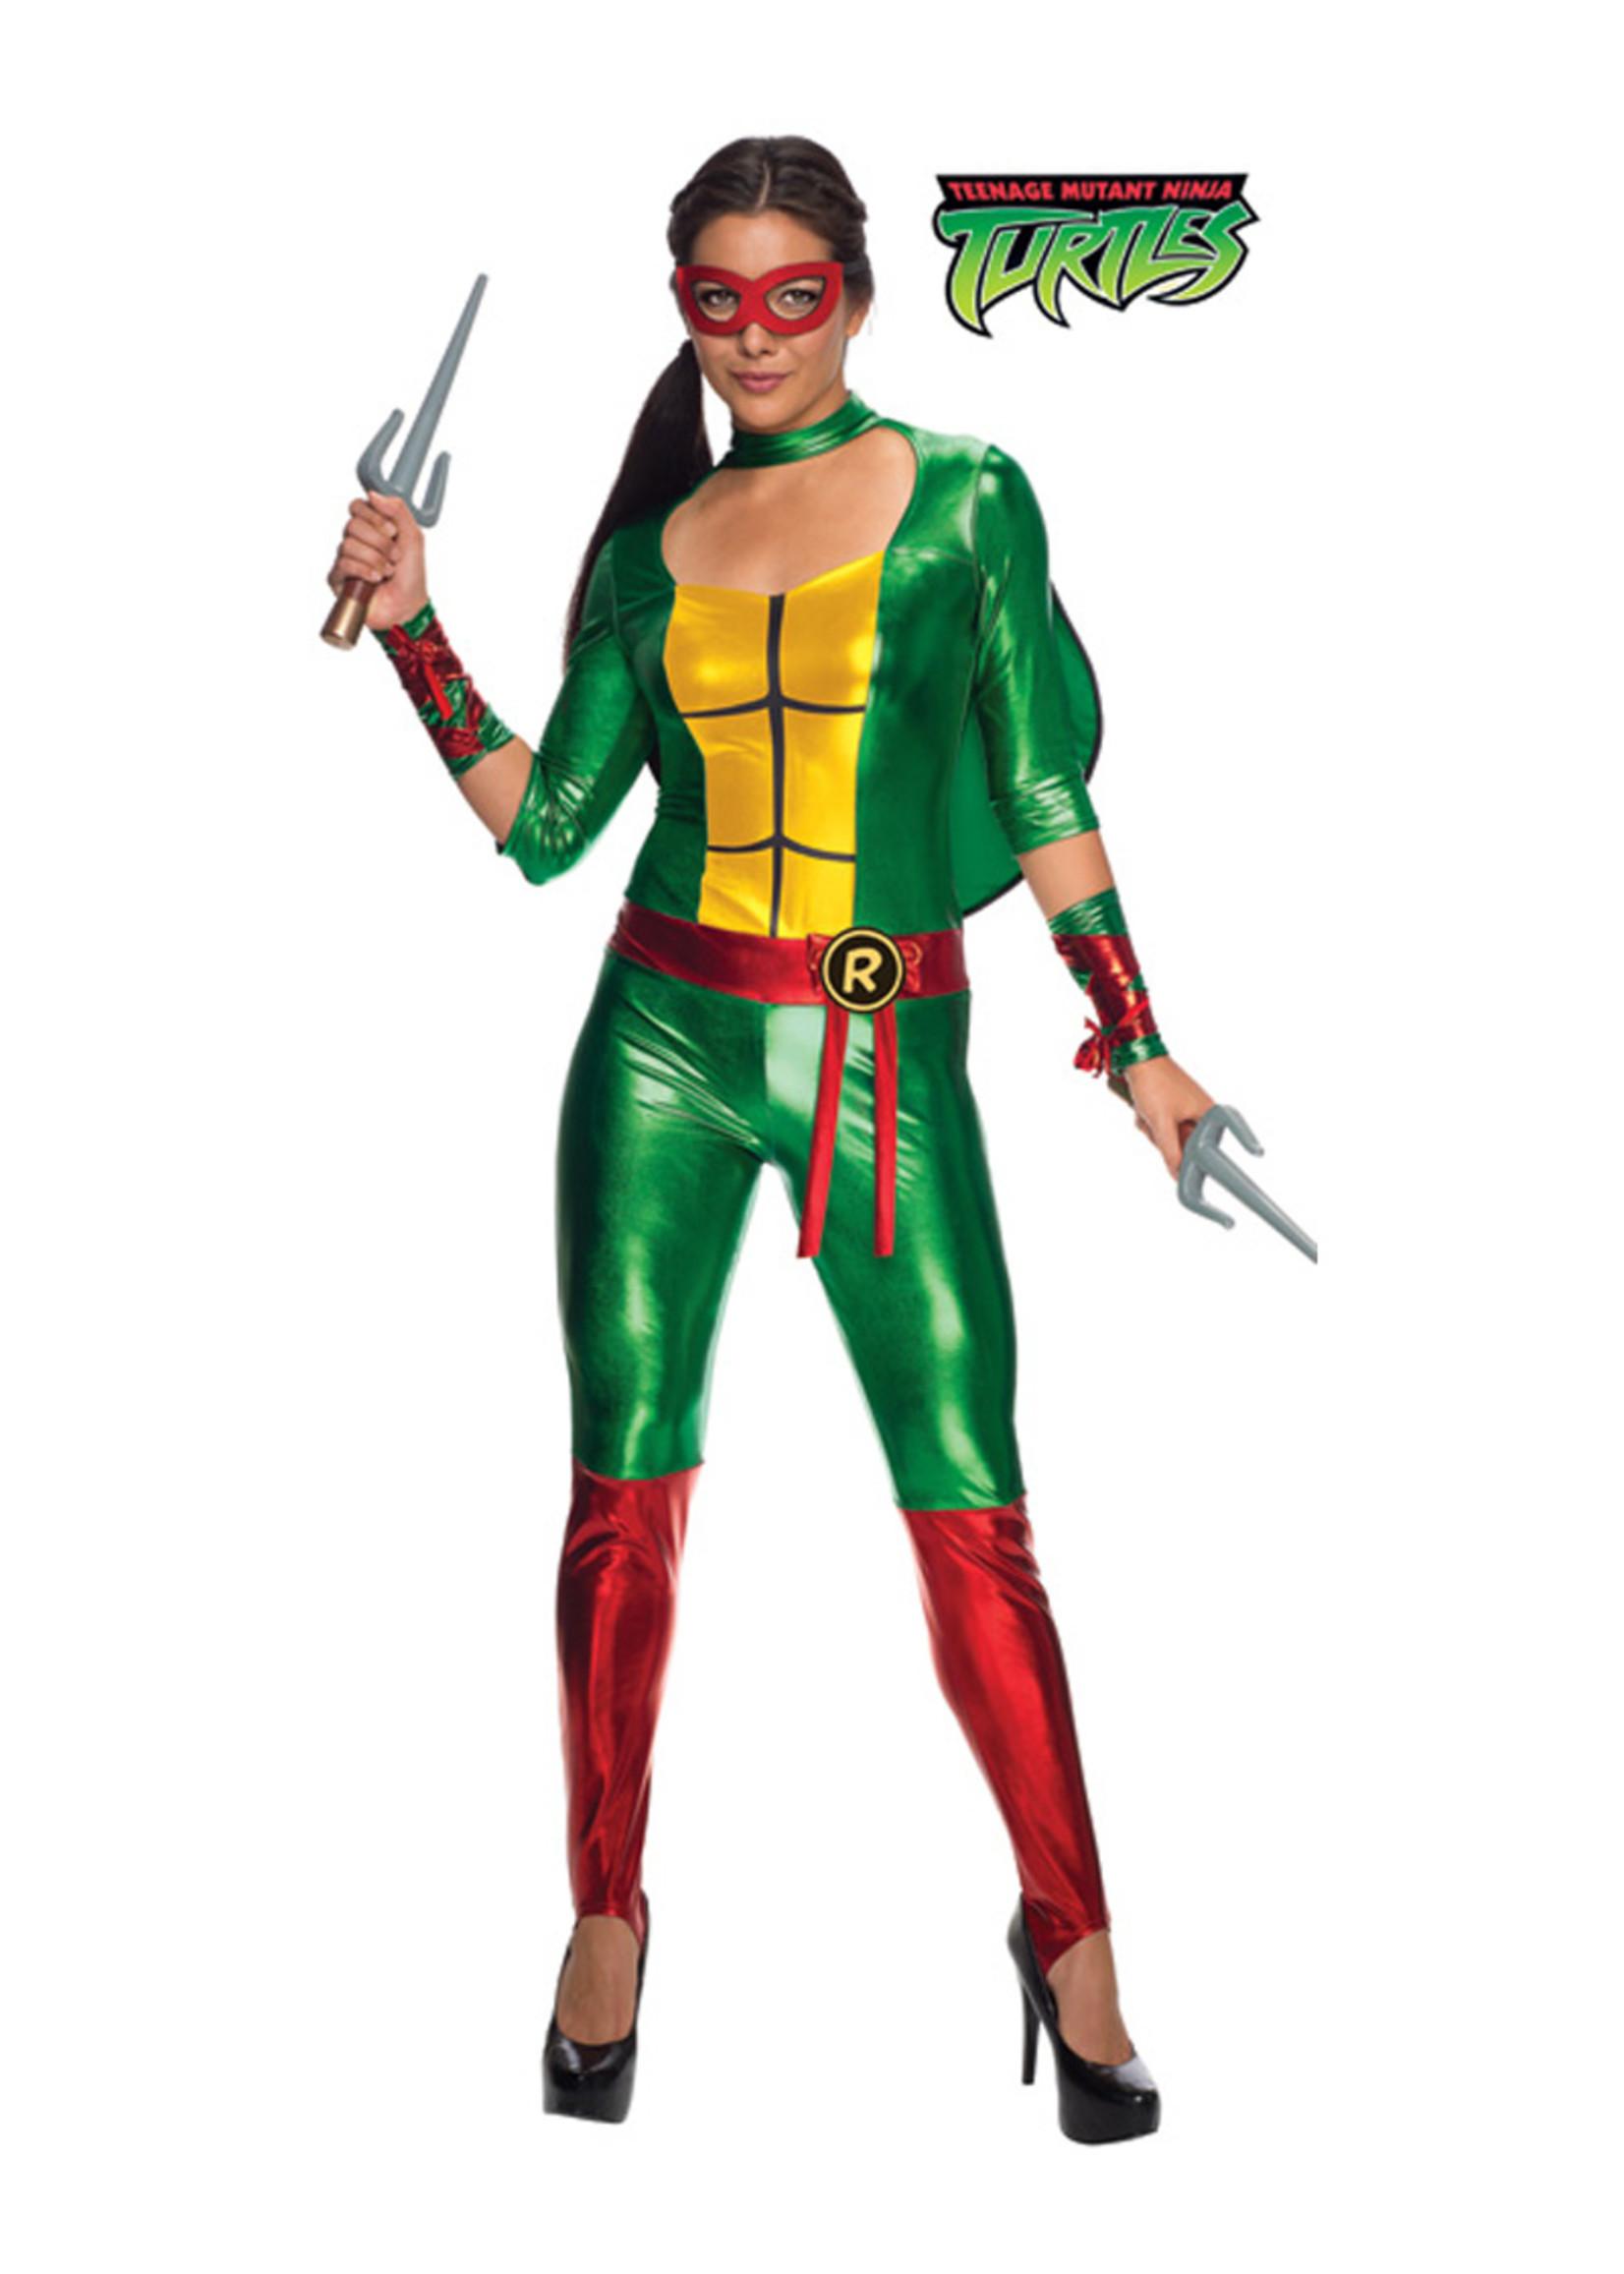 Raphael TMNT Costume - Women's